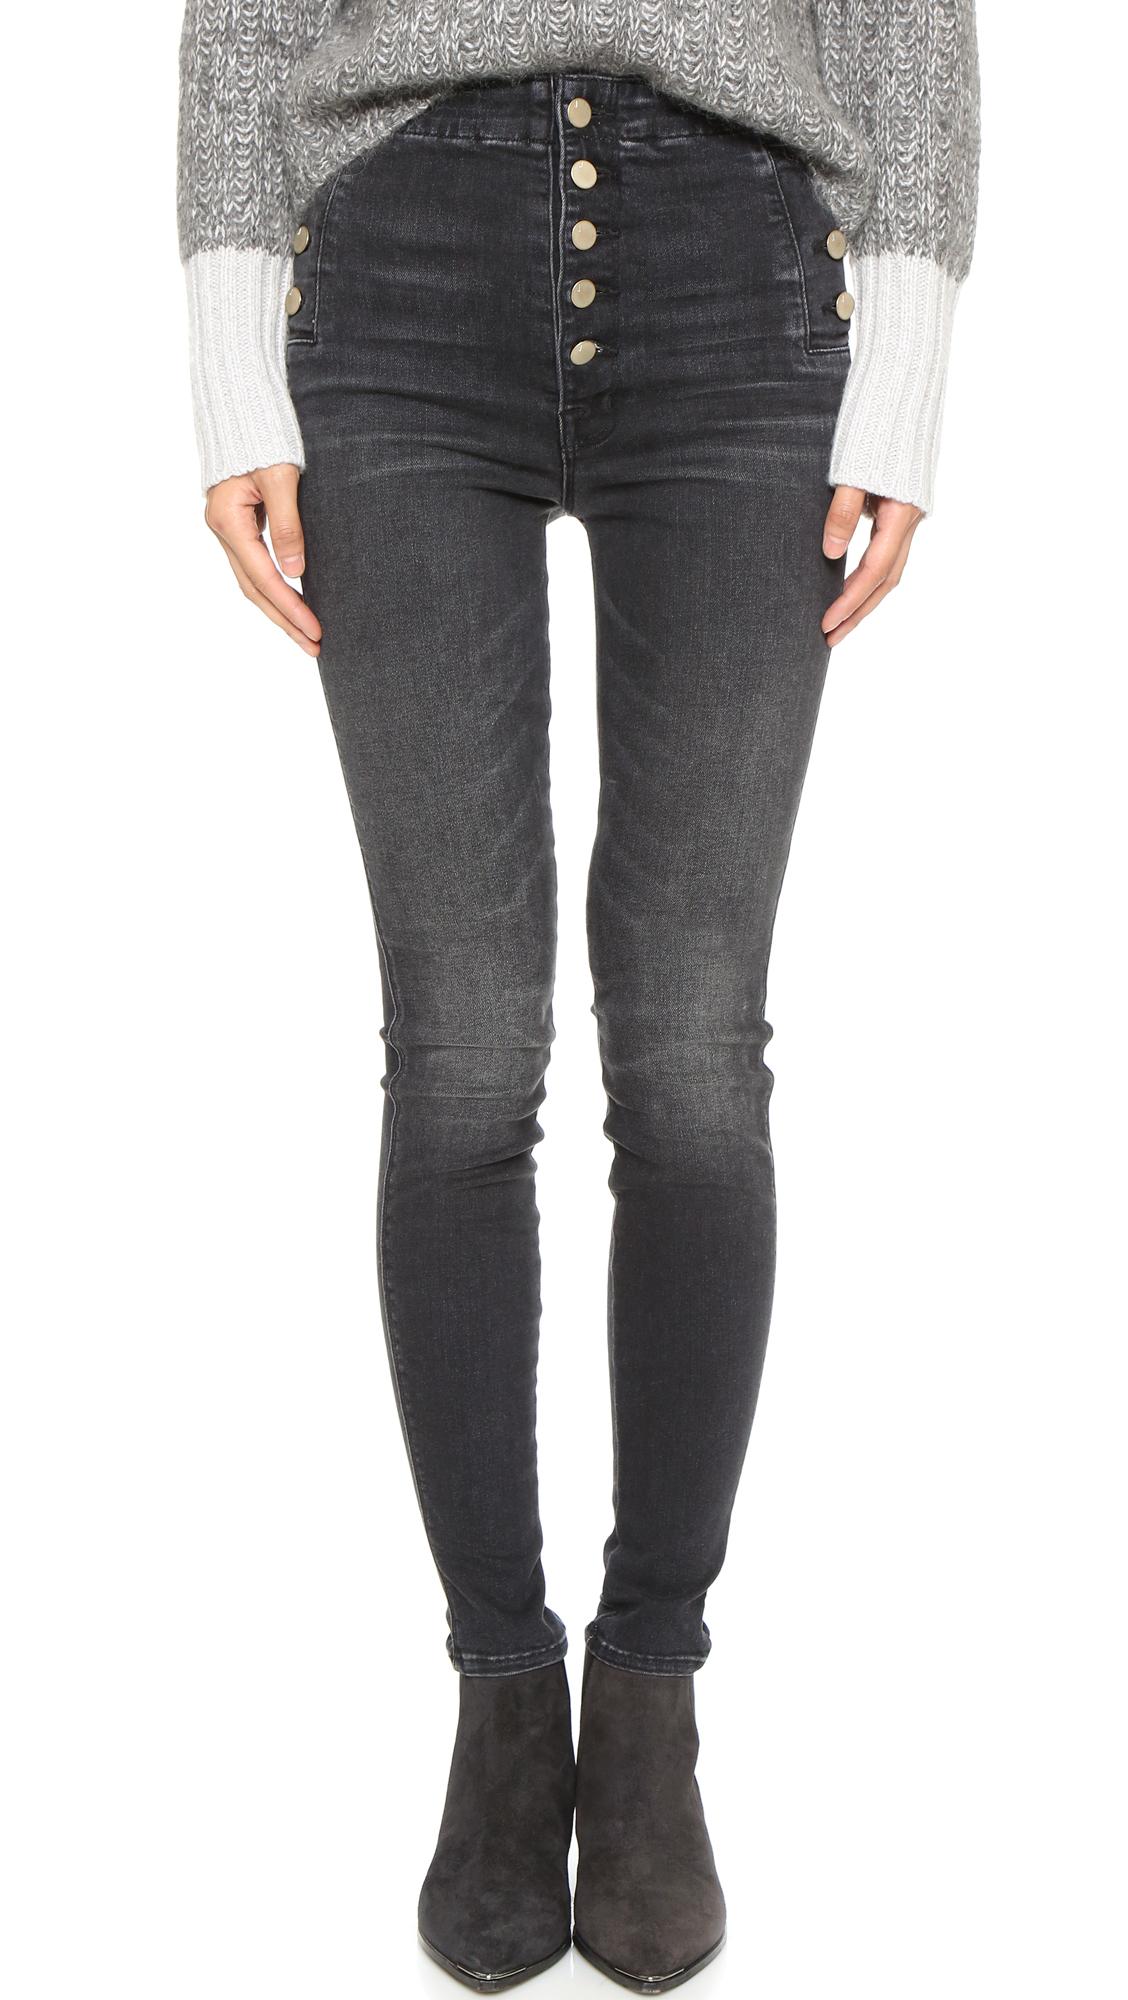 8c8a913c6db Lyst - J Brand Natasha Sky High Skinny Jeans in Gray